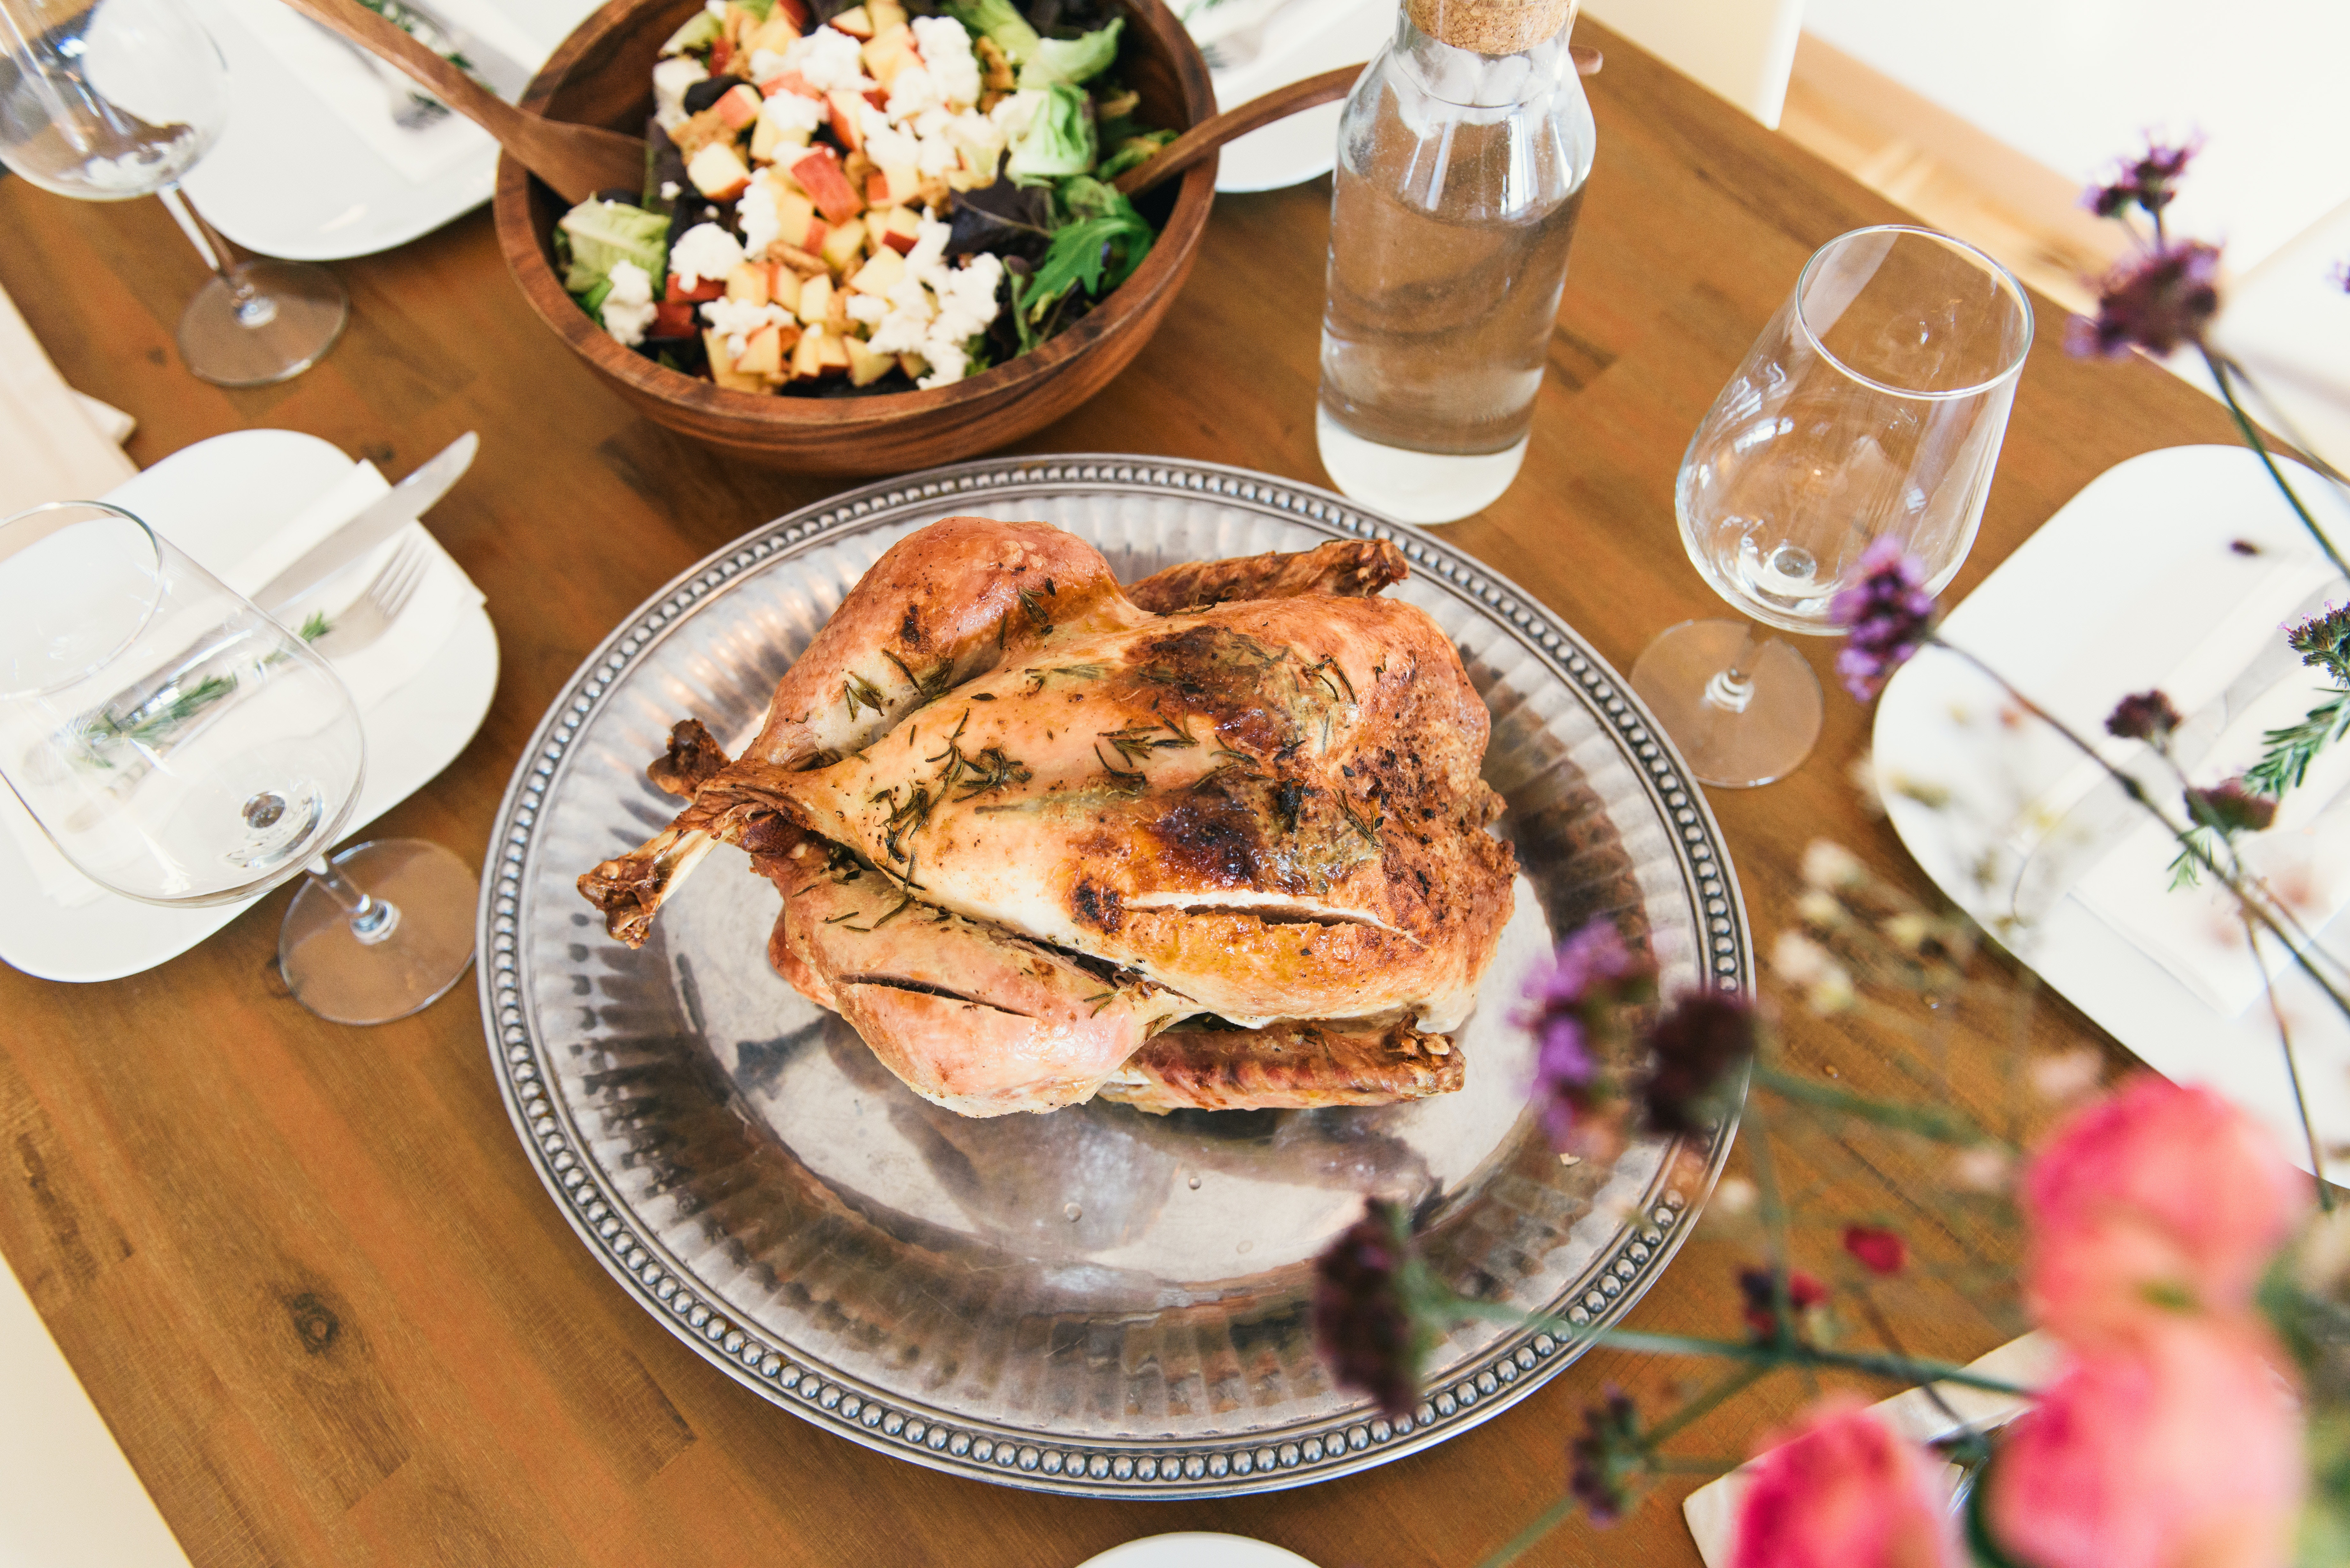 thanksgiving dinner instagram captions you ll definitely want